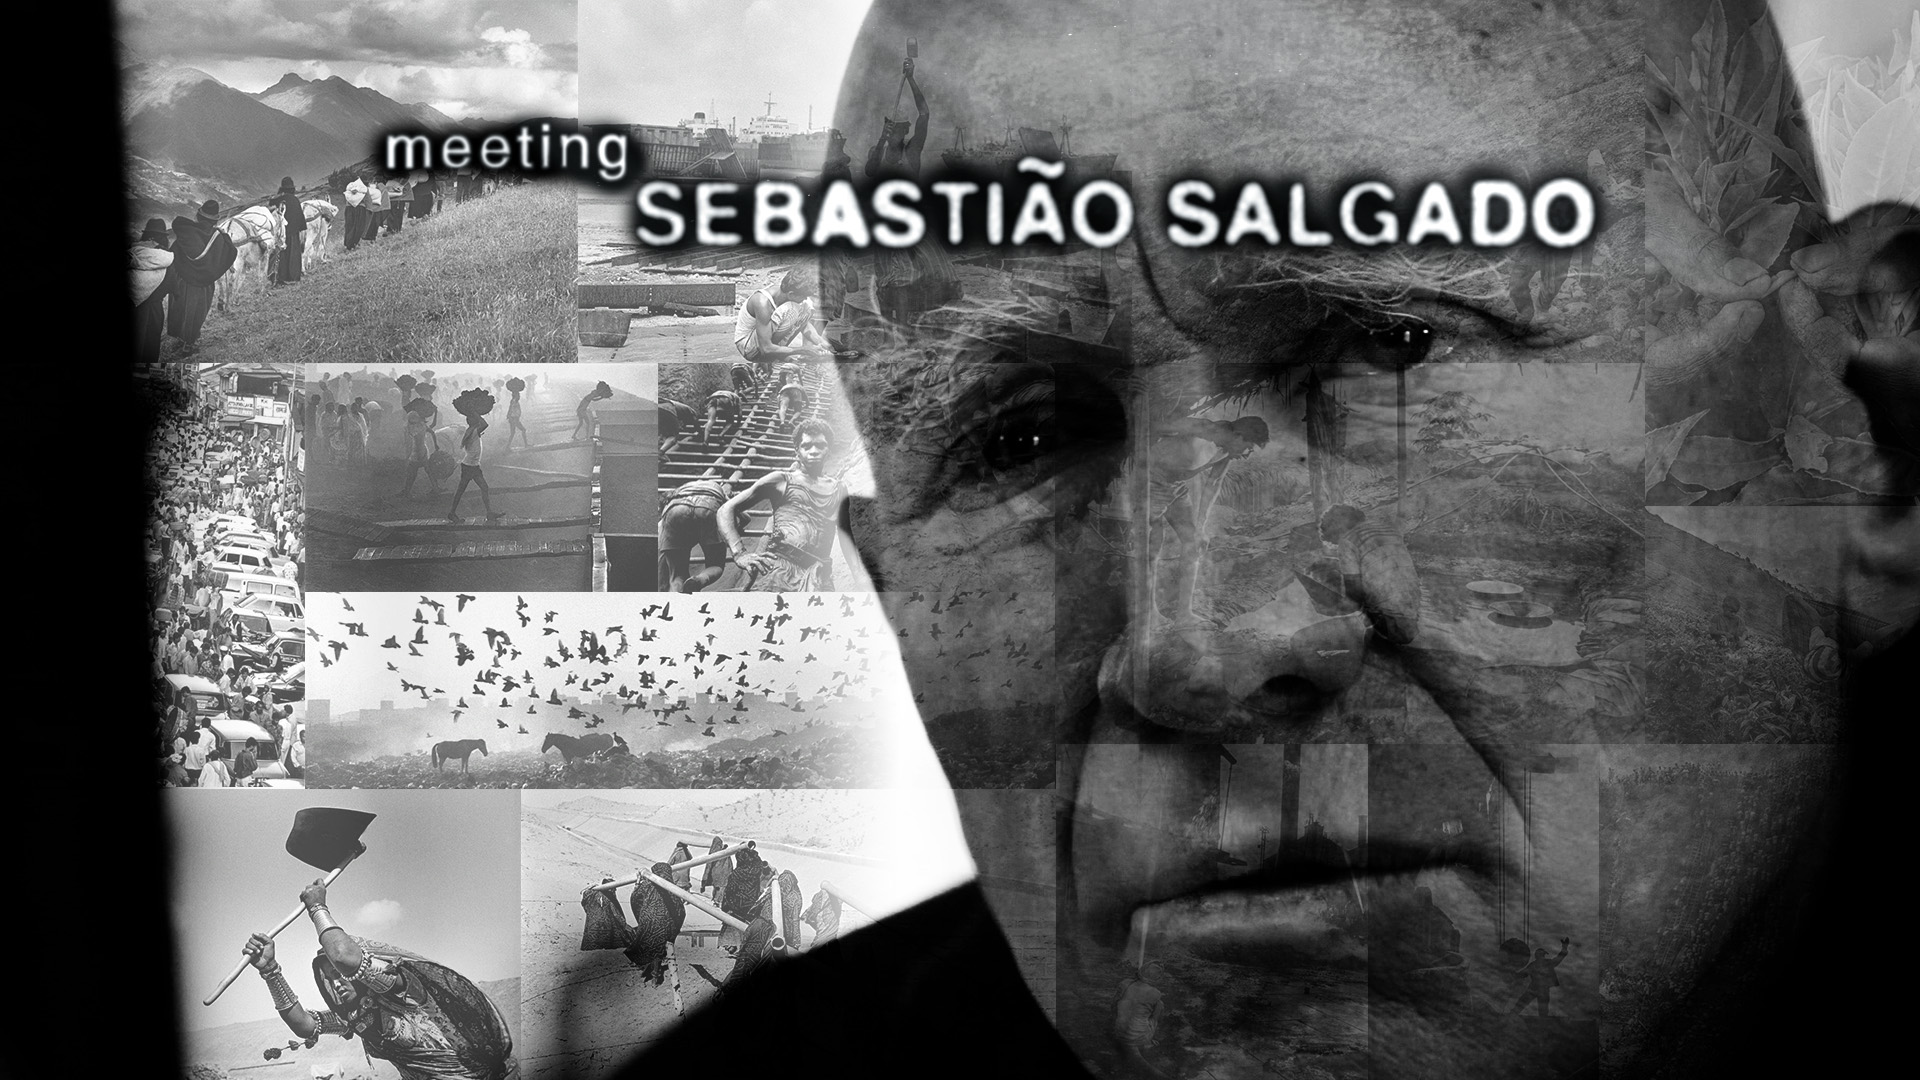 Meeting Sebastião Salgado